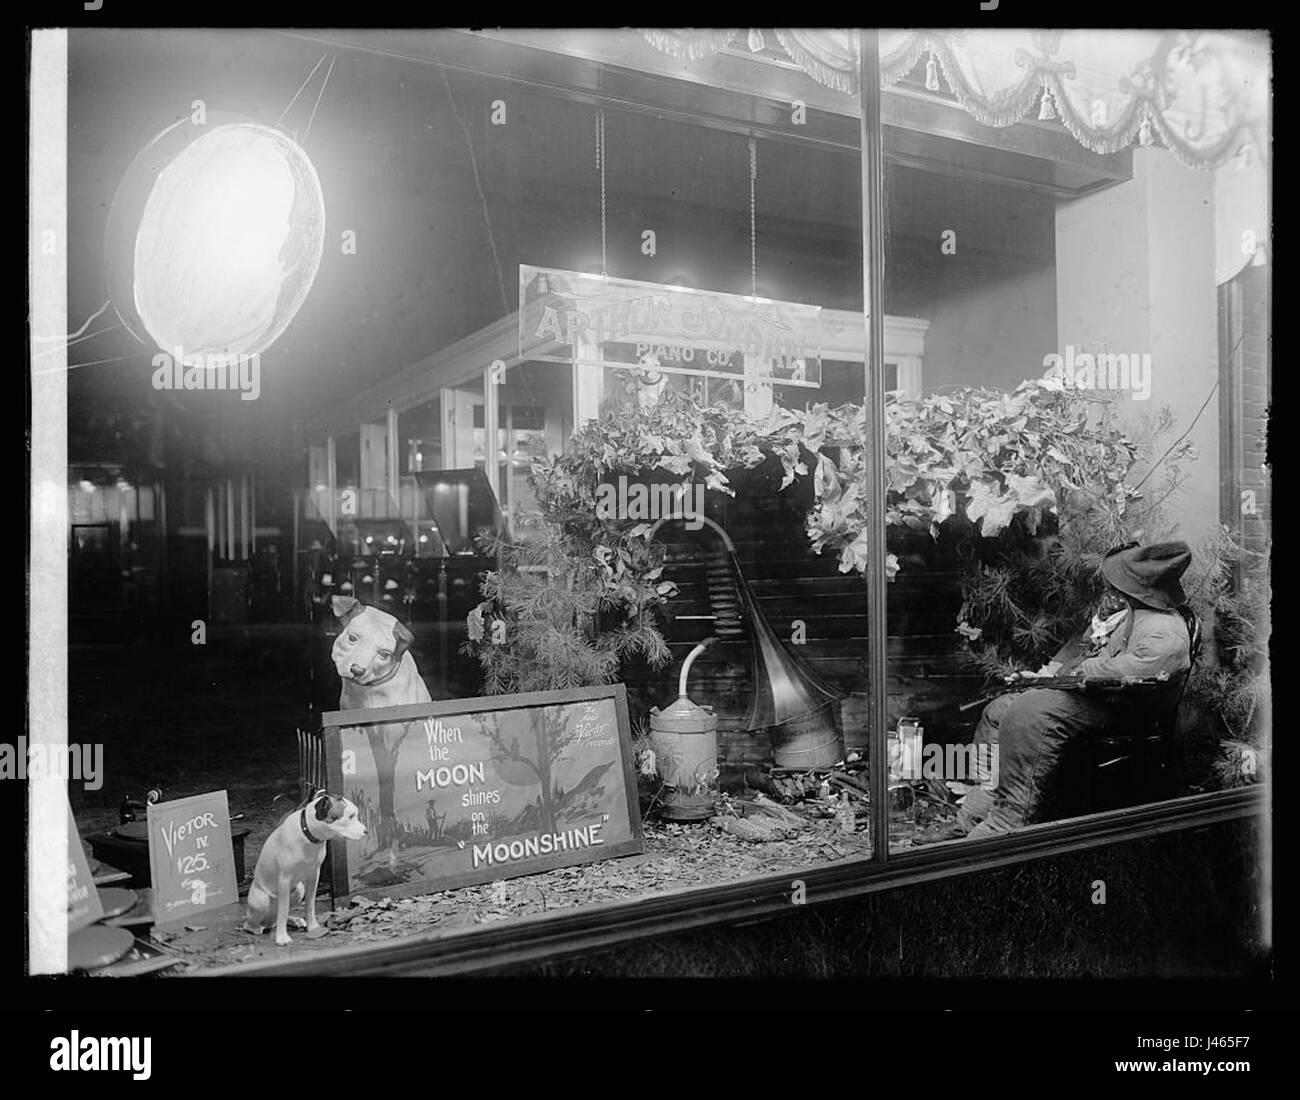 Moonshine window display Jordan Piano Company - Stock Image